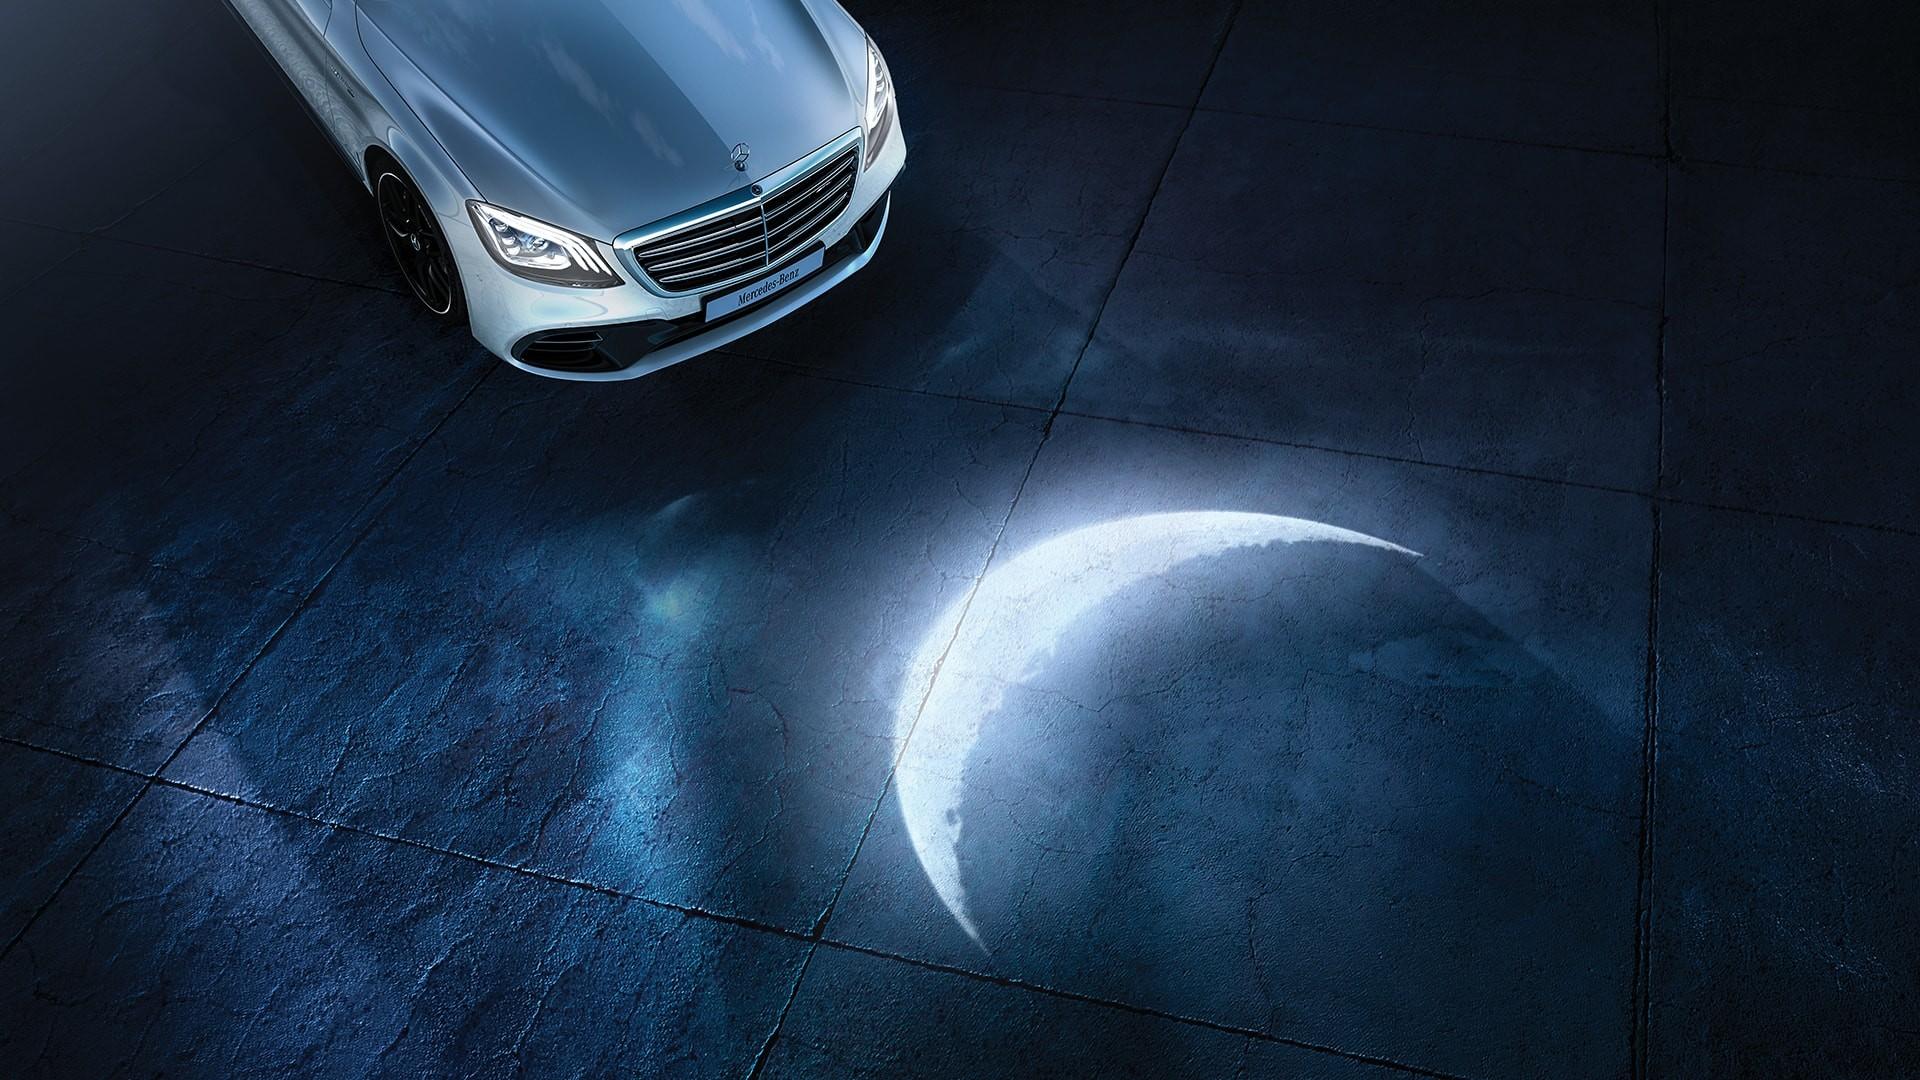 Mercedes-Benz Ramadan 2018 Campaign - Hatch Design - Digital Creative Agency